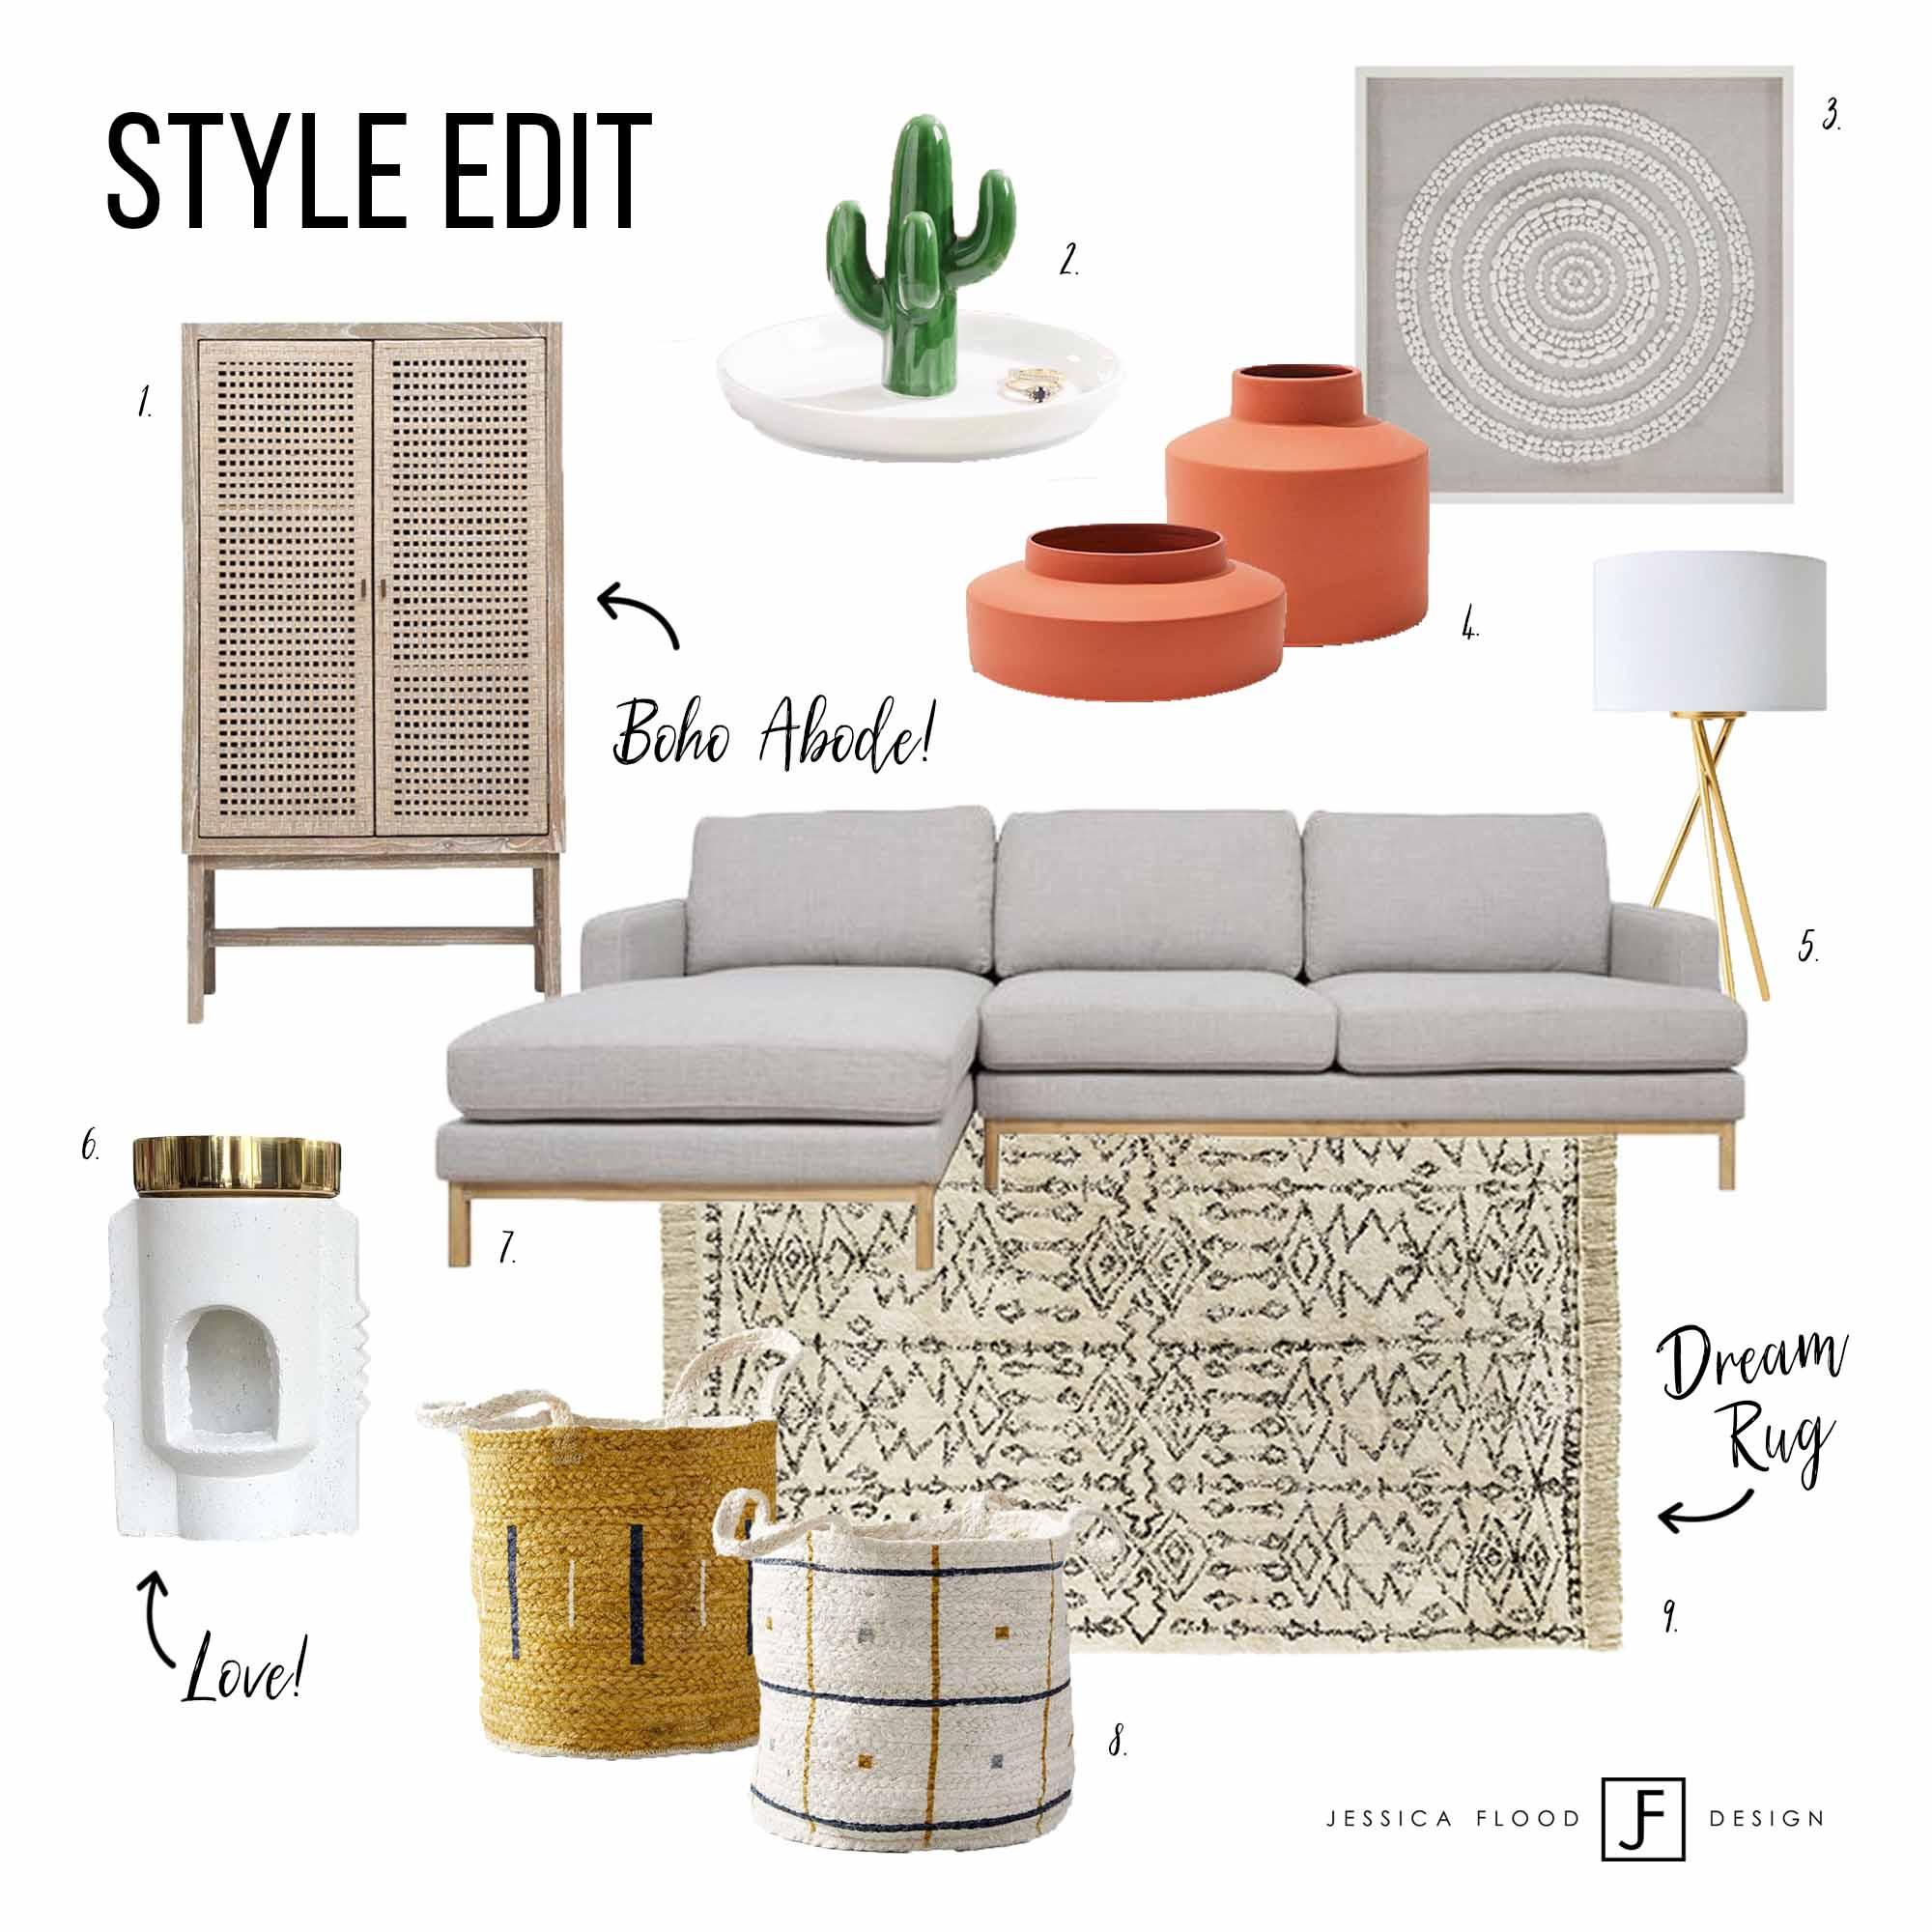 Style Edit Boho Abode_Jessica Flood Design.jpg